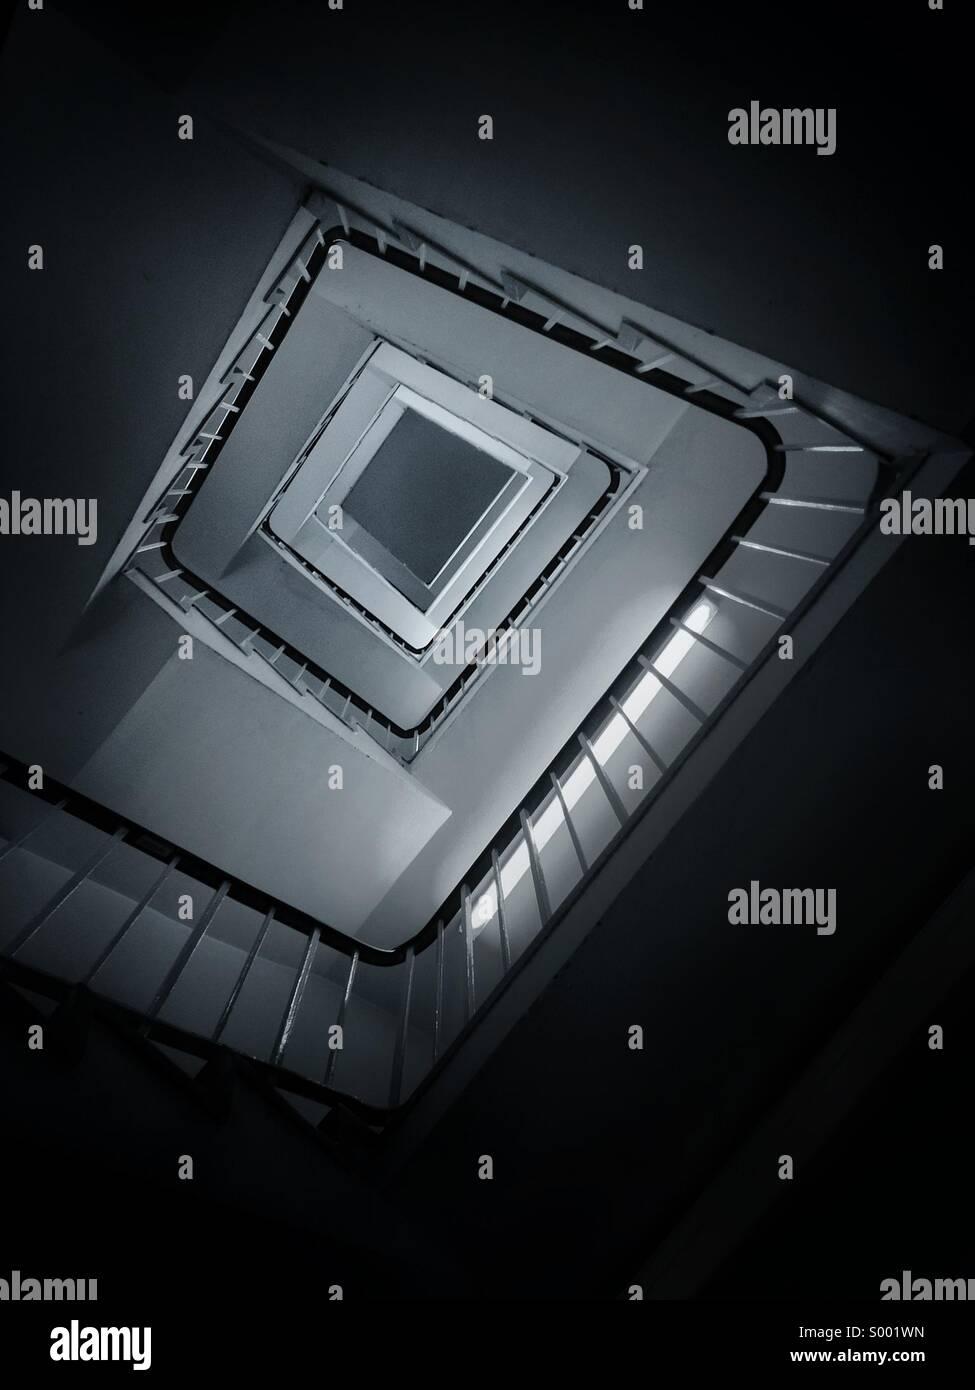 Visión abstracta de escaleras en espiral. Imagen De Stock